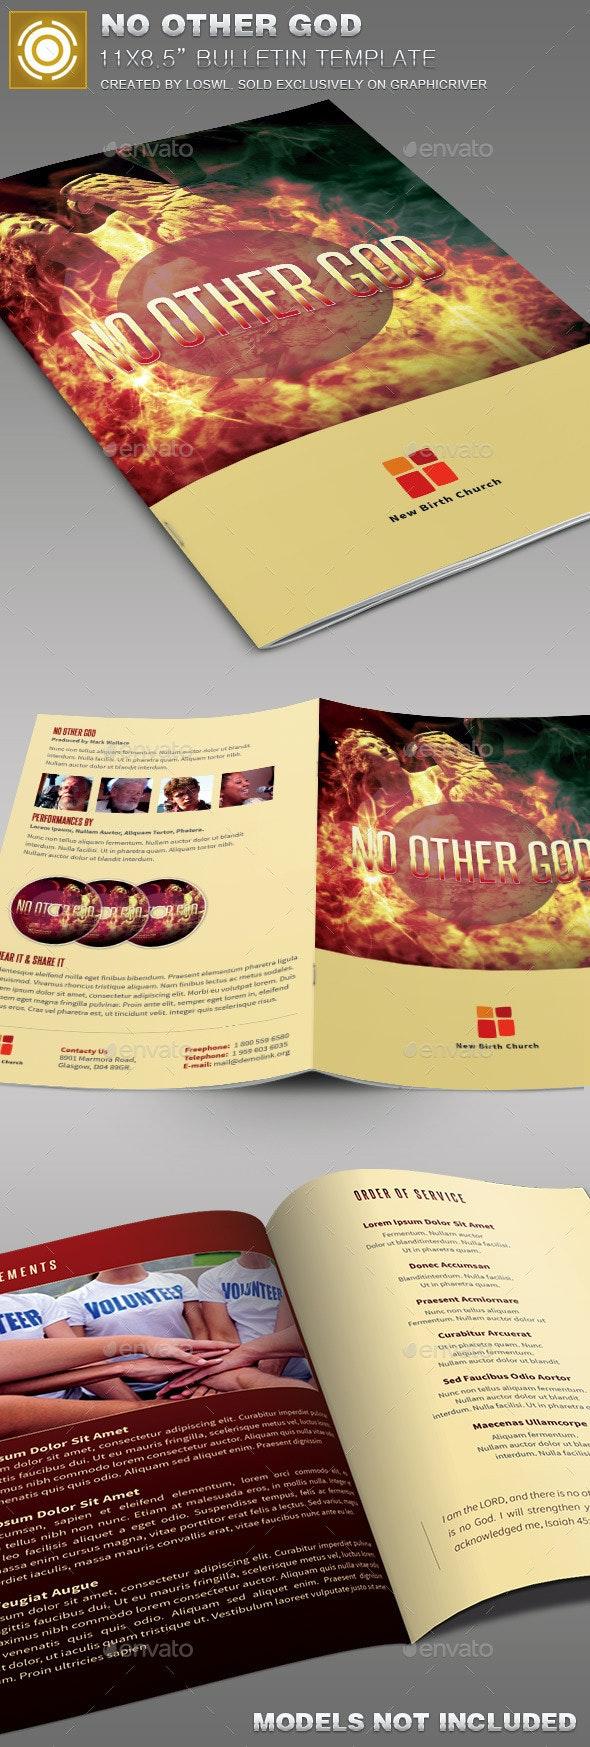 No Other God  Church Bulletin Template - Informational Brochures